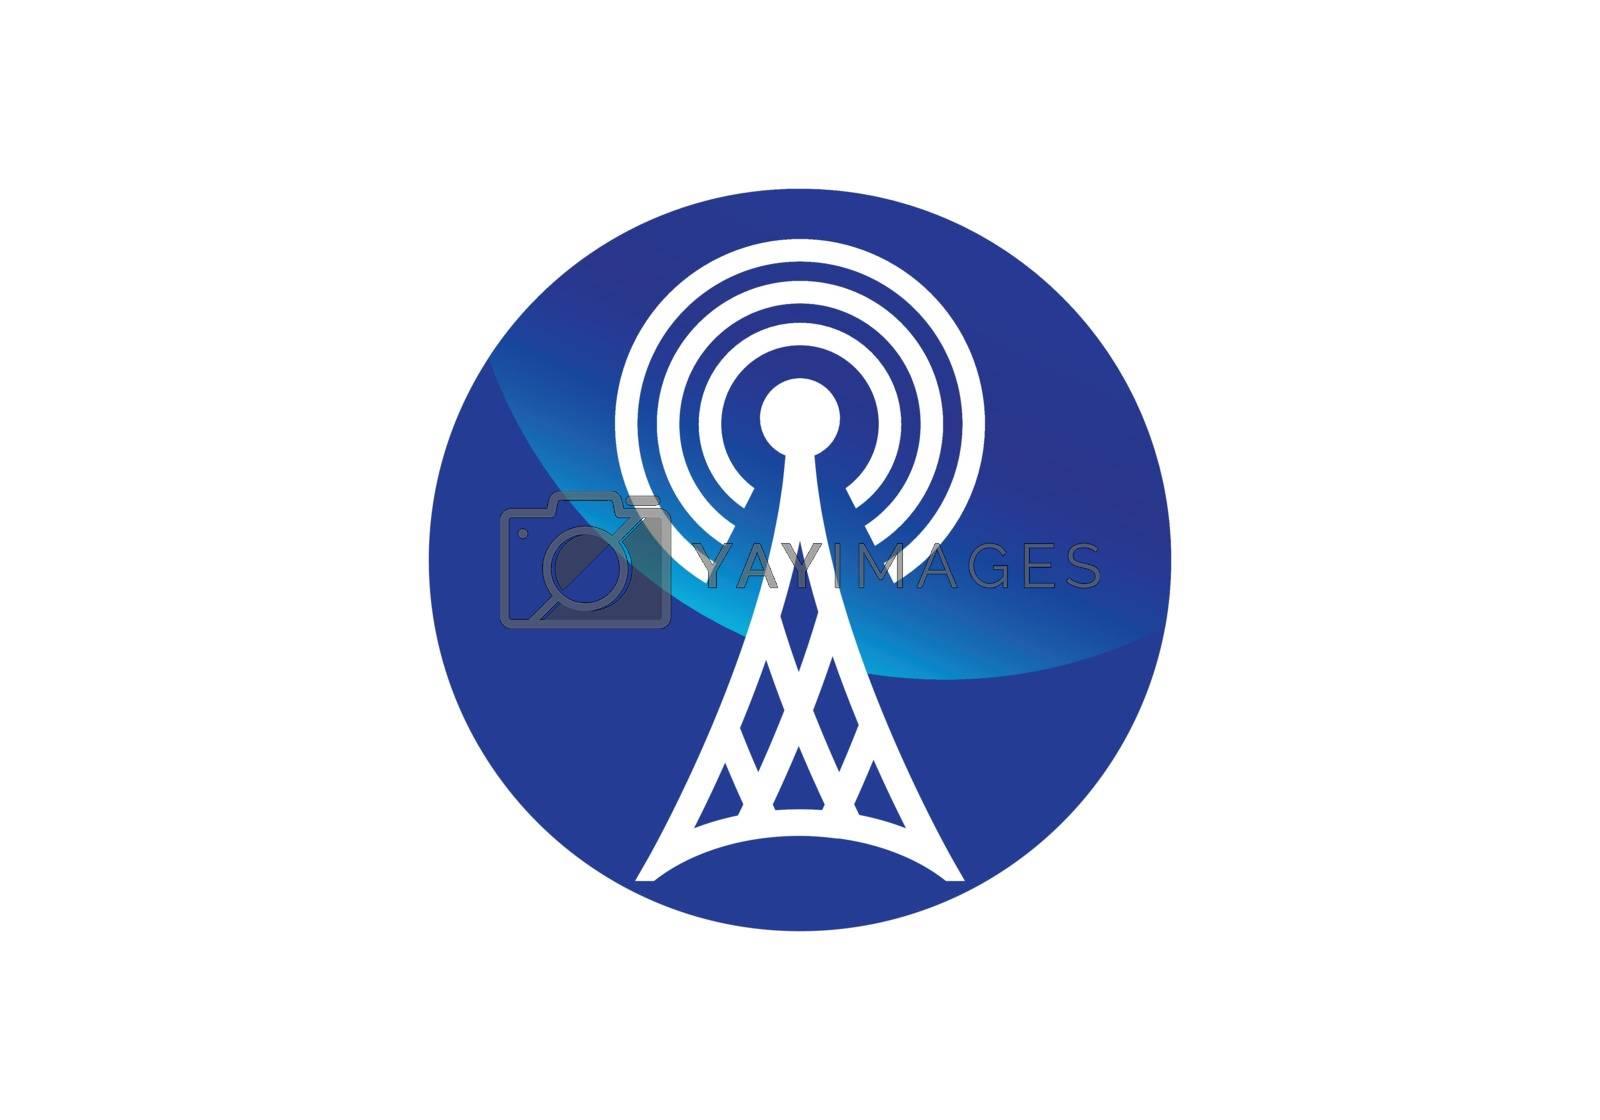 WiFi symbol. Wireless internet connection or hotspot sign. Outline modern design element.